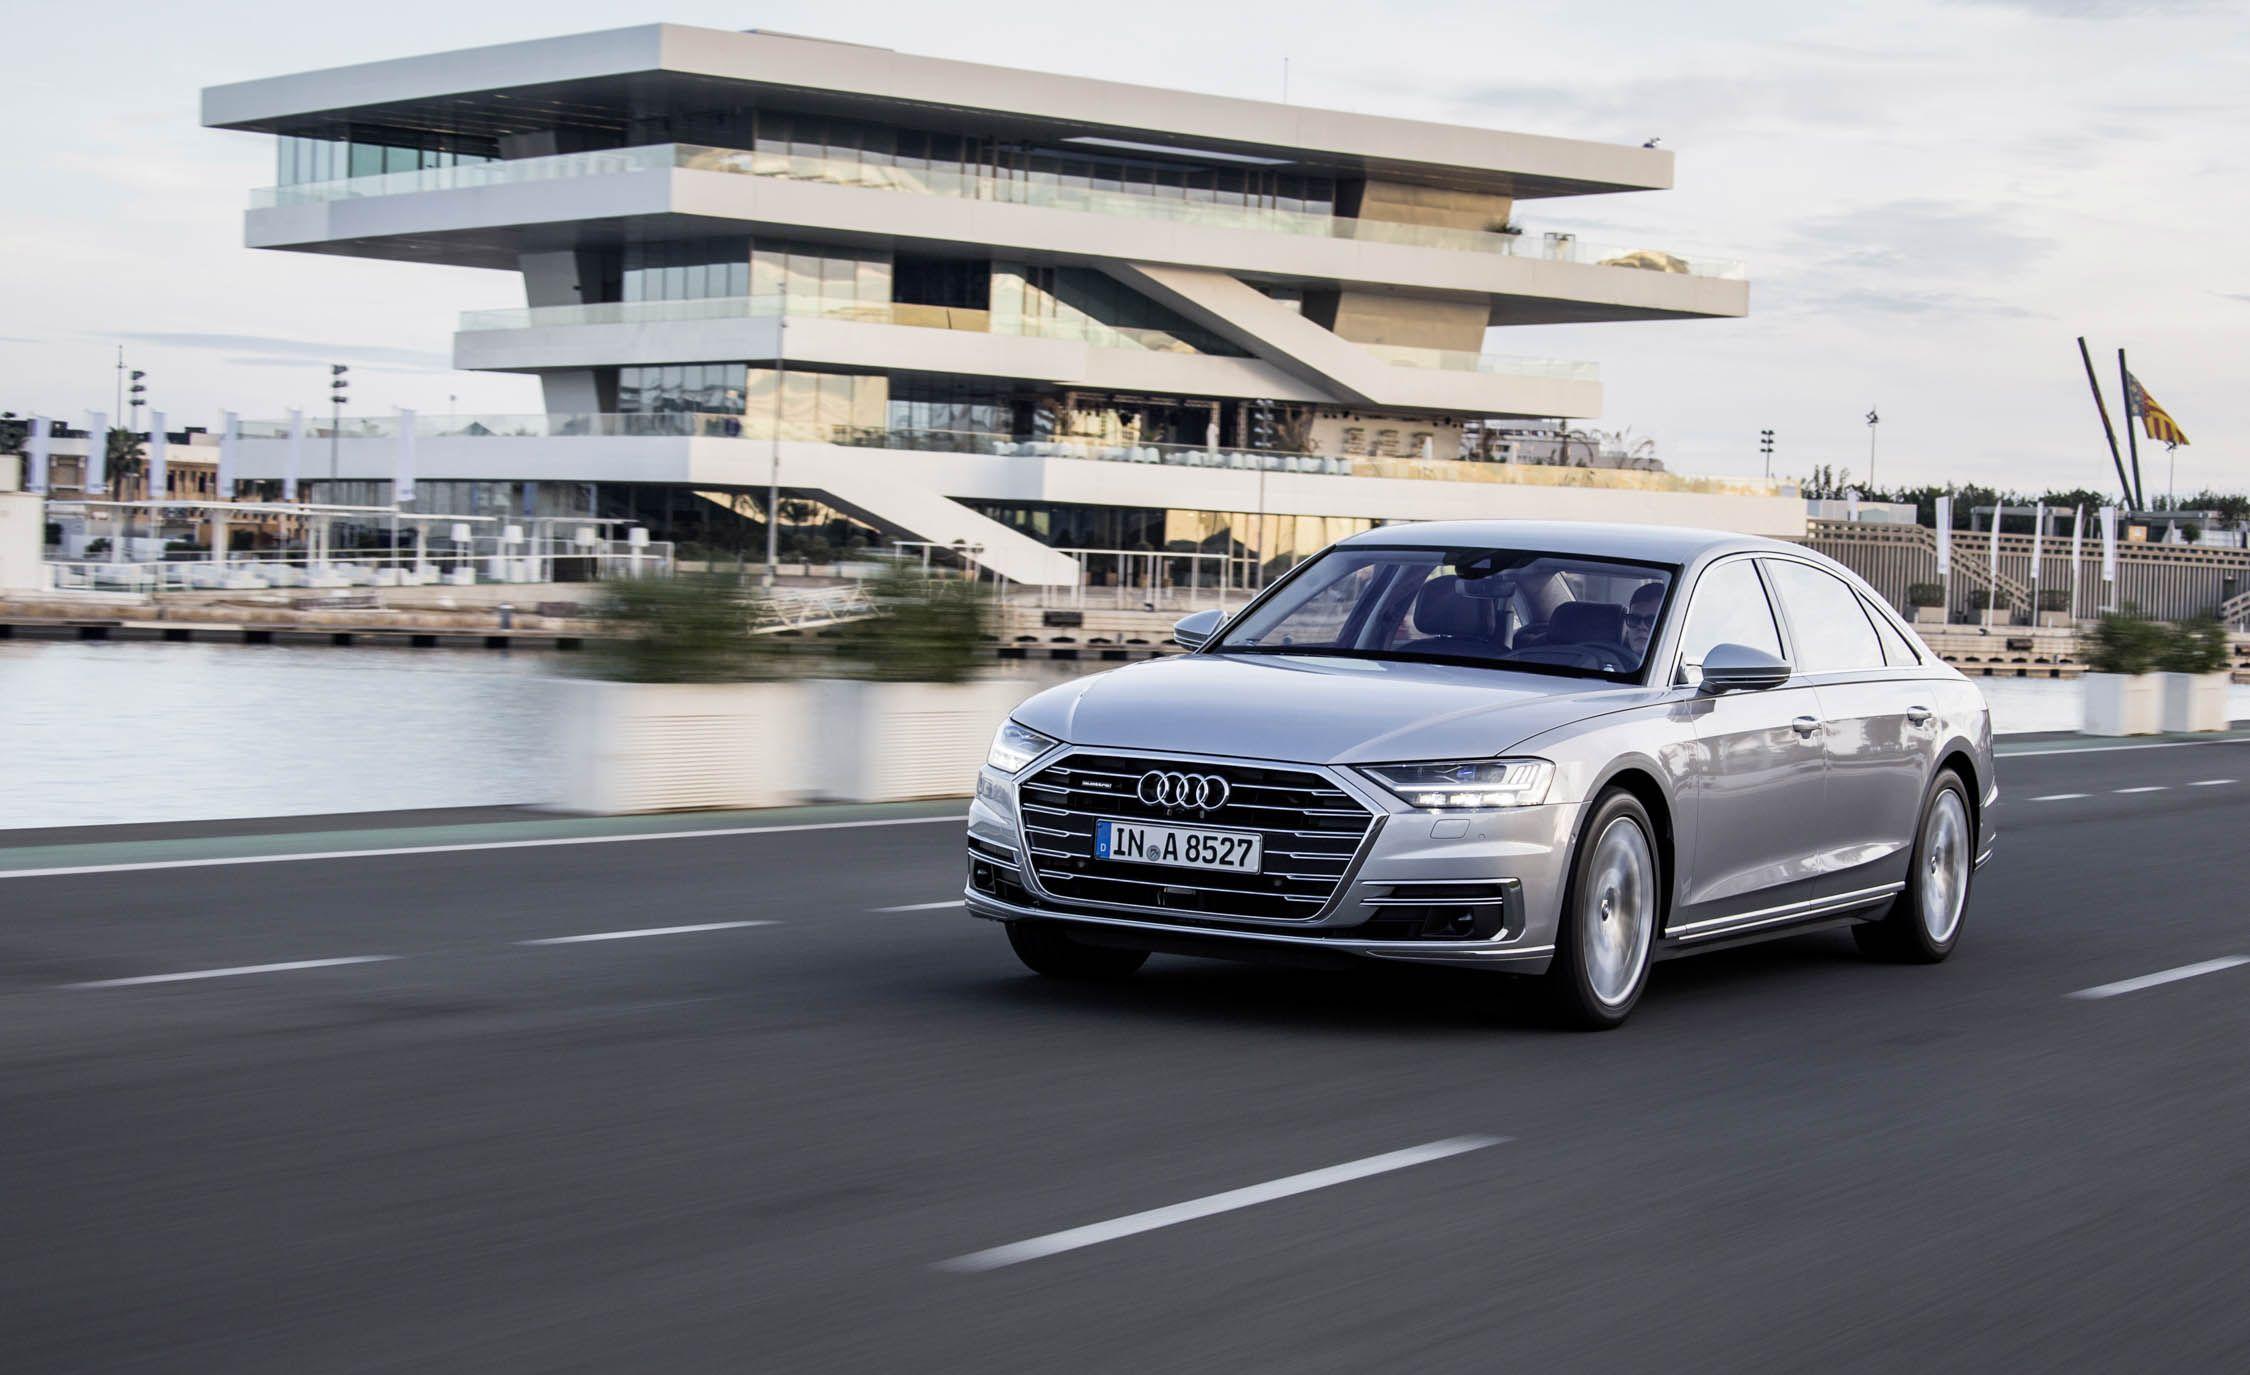 https://hips.hearstapps.com/amv-prod-cad-assets.s3.amazonaws.com/wp-content/uploads/2017/10/2018-Audi-A8-L-102.jpg